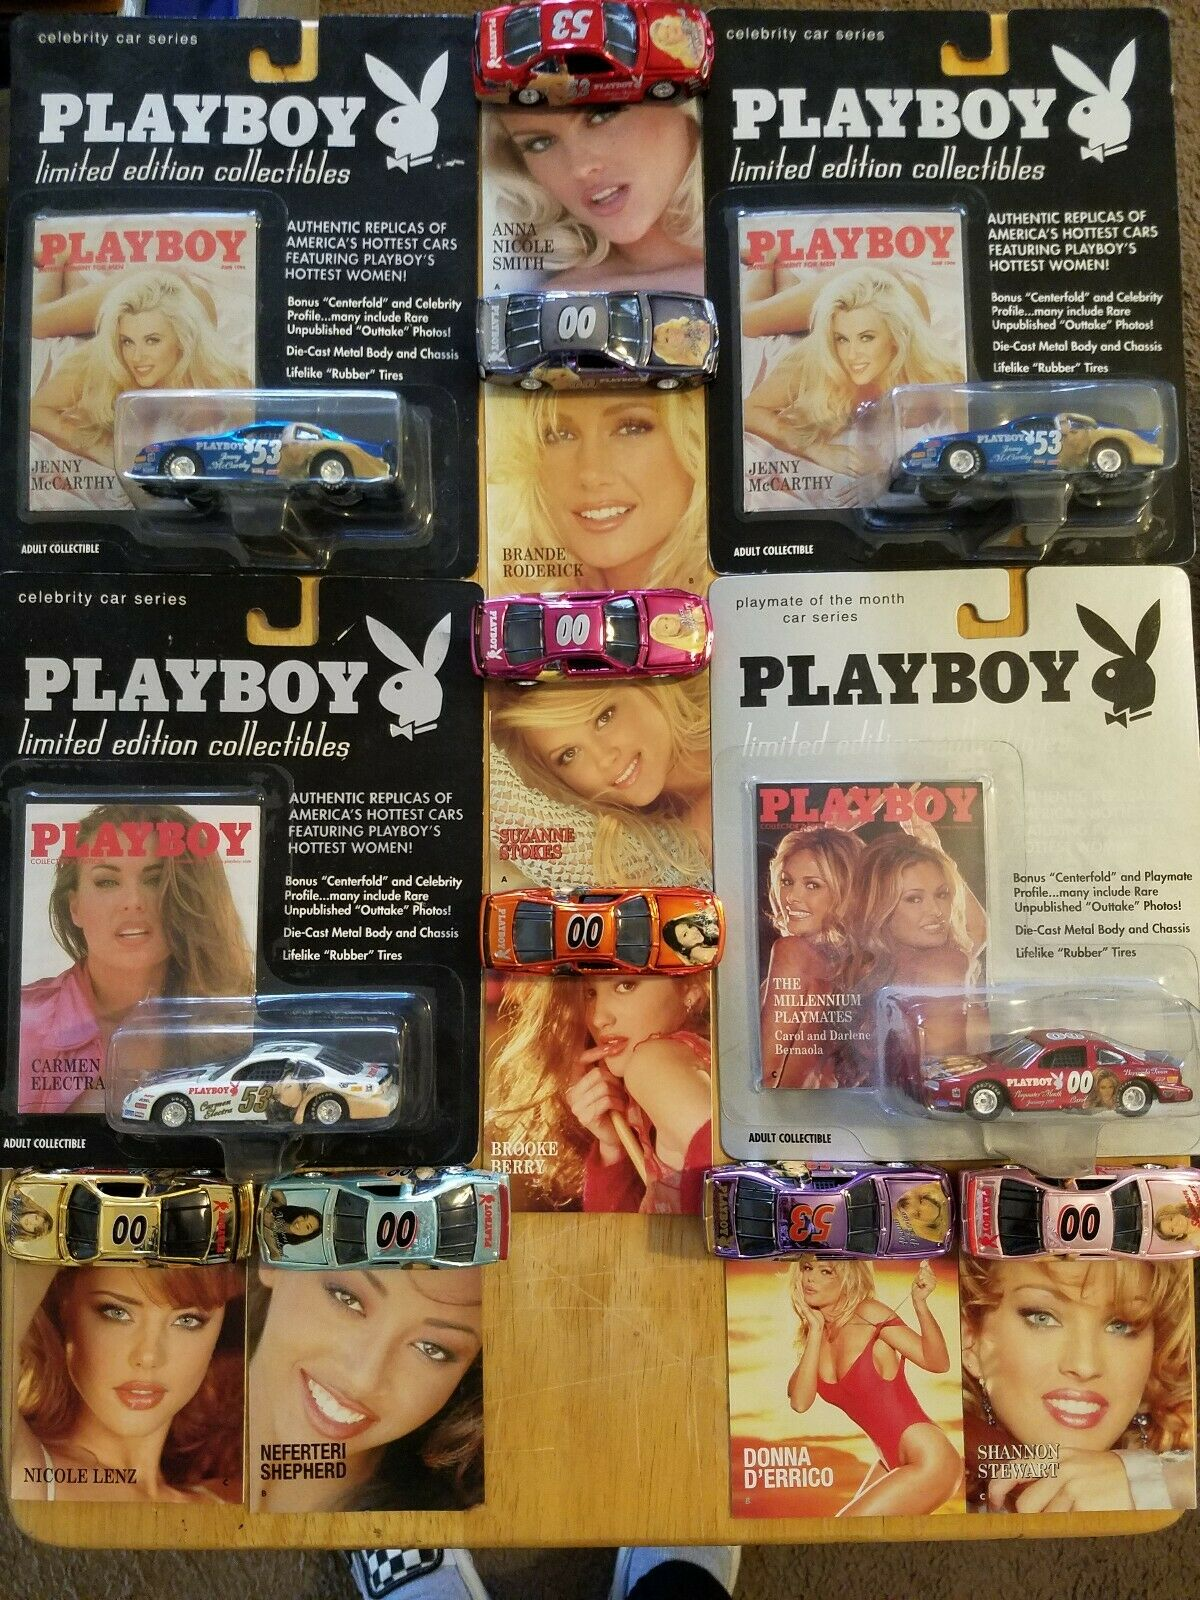 Lote de 12 Autos Nascar Playboy Jenny McCarthy Donna d'errico Bernaola Electra